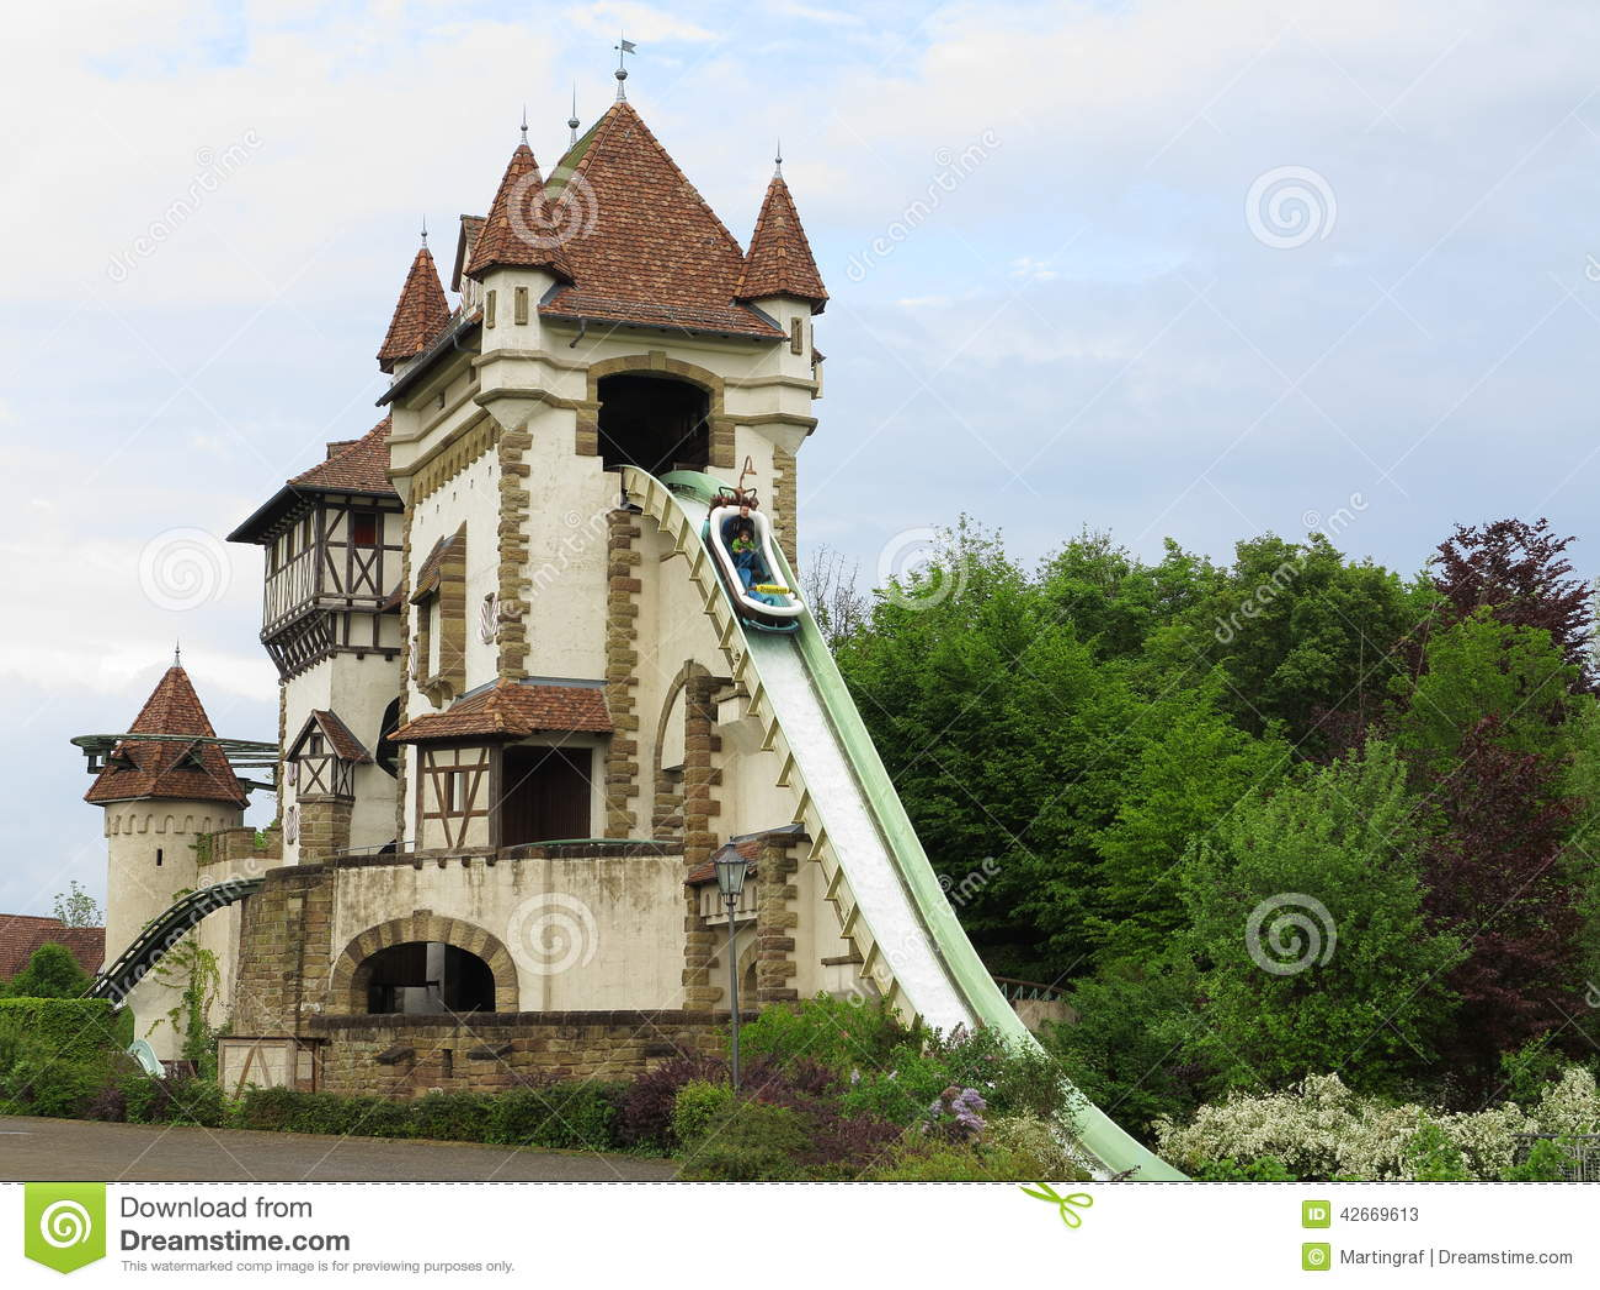 Castle finale date in Melbourne